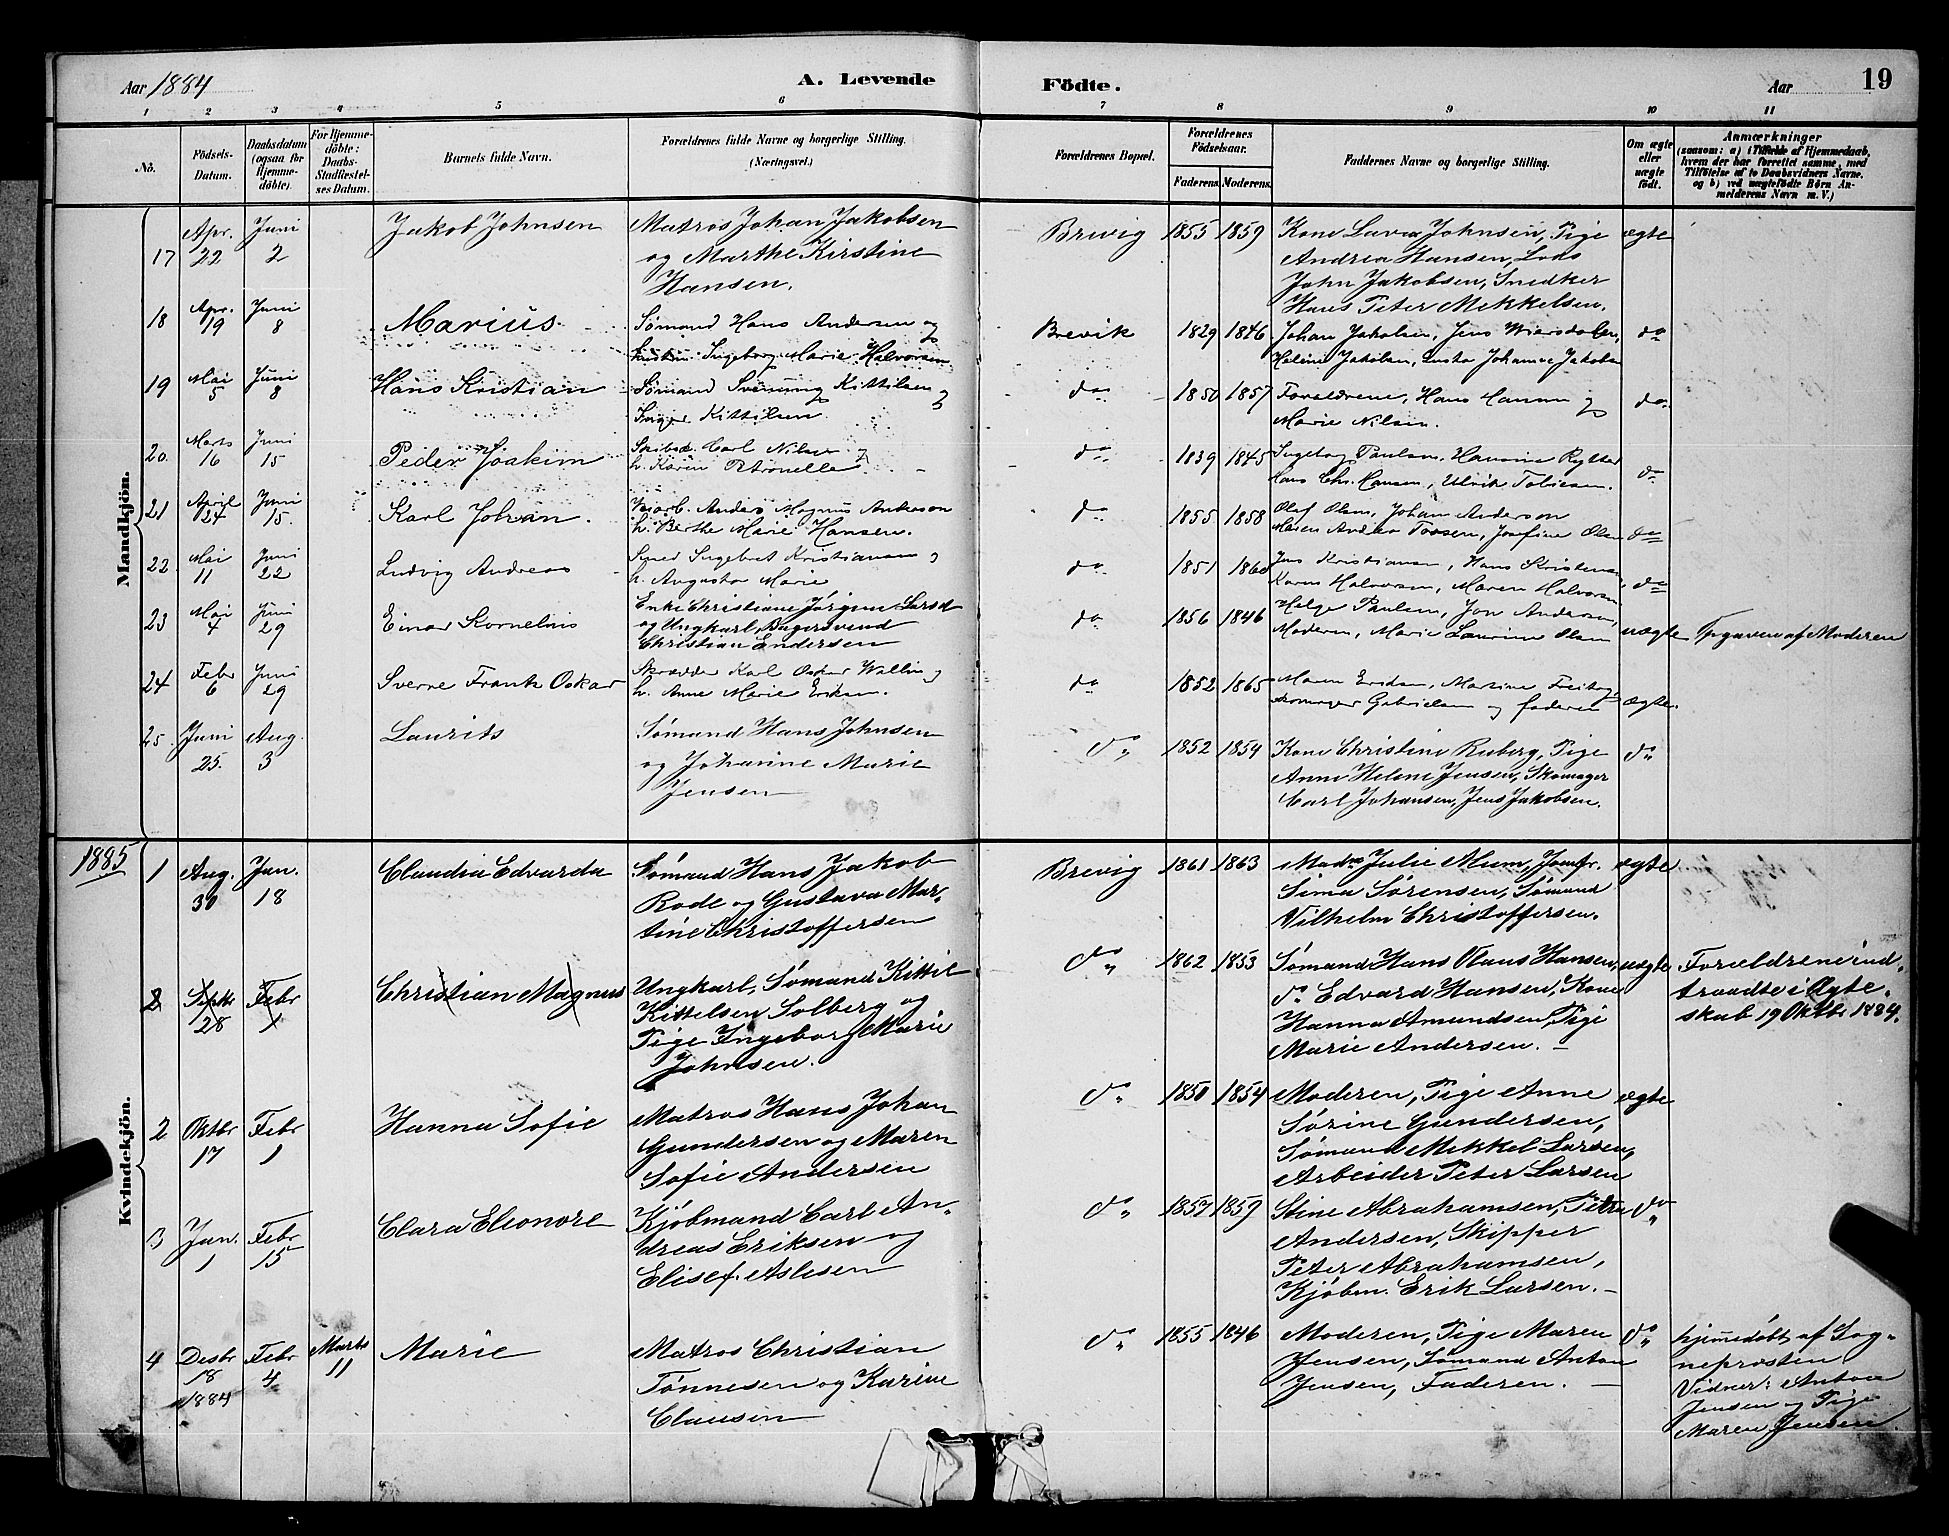 SAKO, Brevik kirkebøker, G/Ga/L0004: Klokkerbok nr. 4, 1882-1900, s. 19